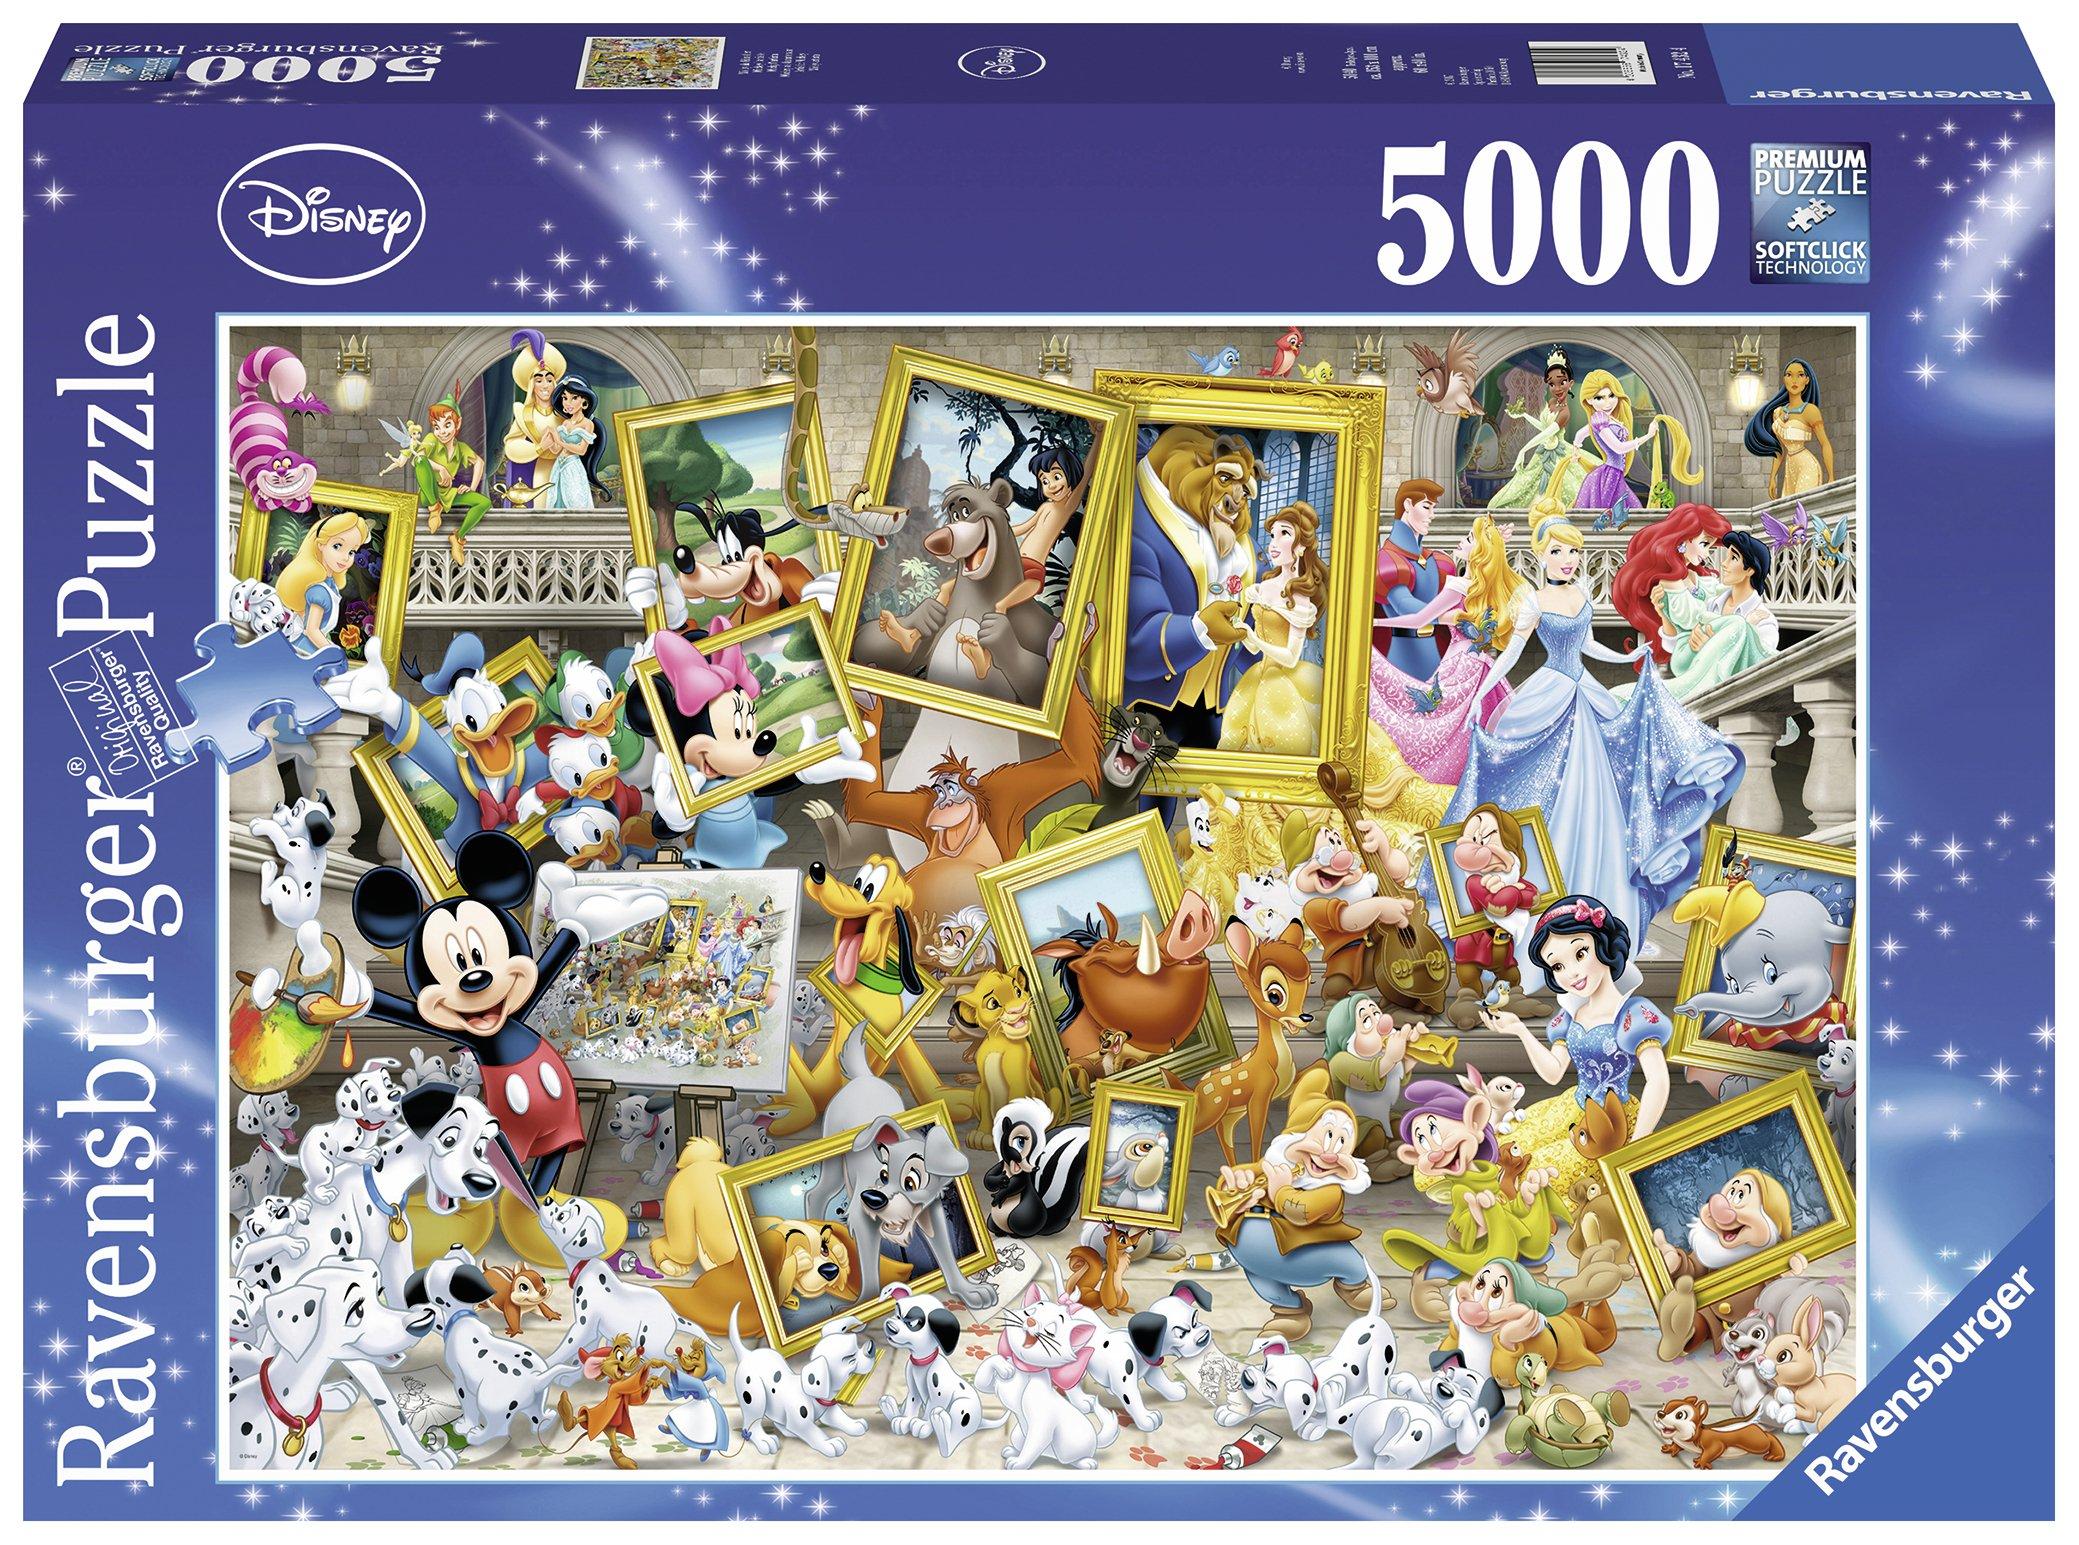 Ravensburger Mickey As Artist Jigsaw Puzzle (5000 Piece)